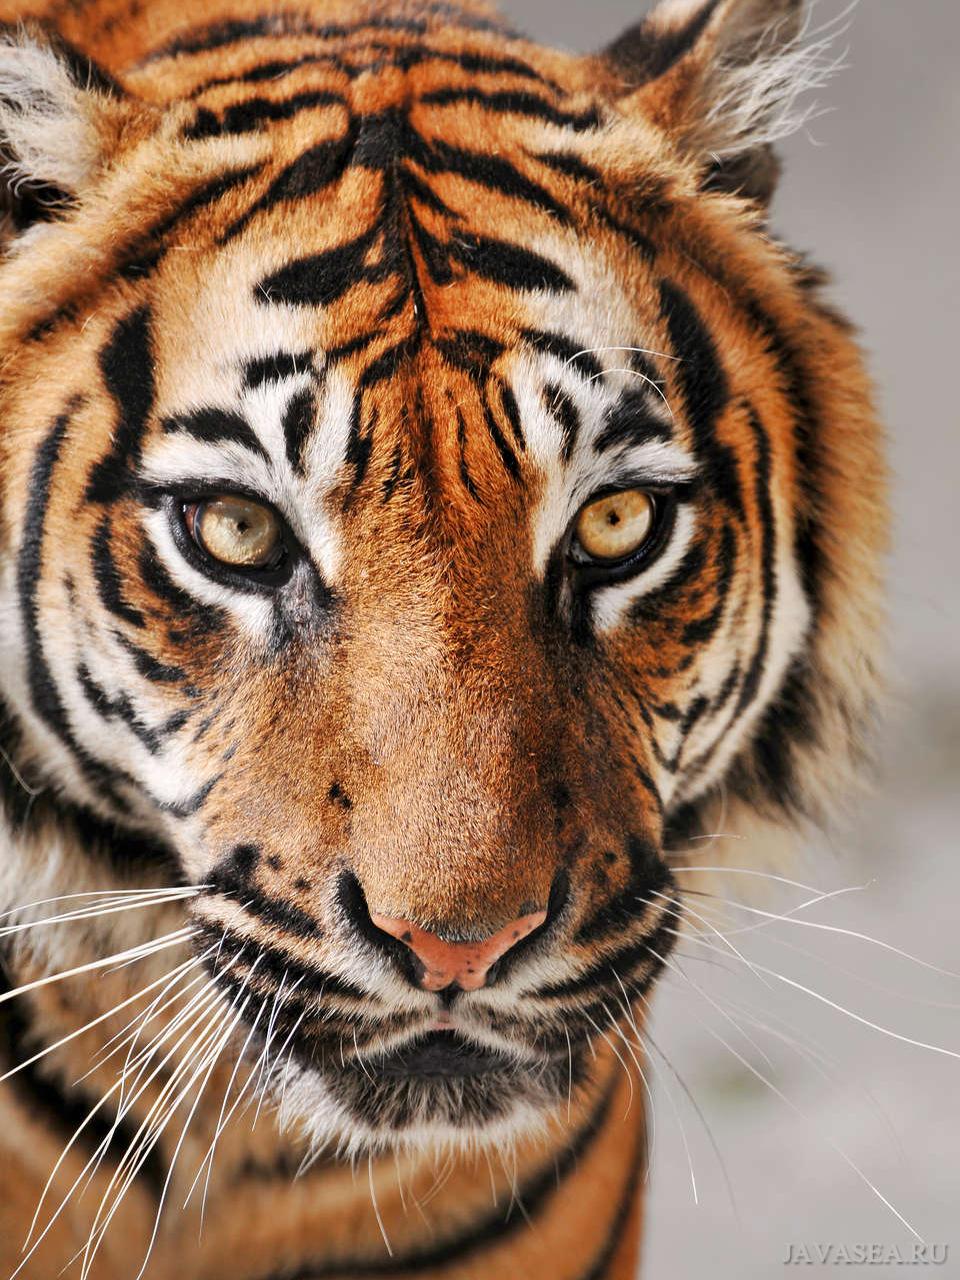 Картинки с тигром на аву, открытки днем